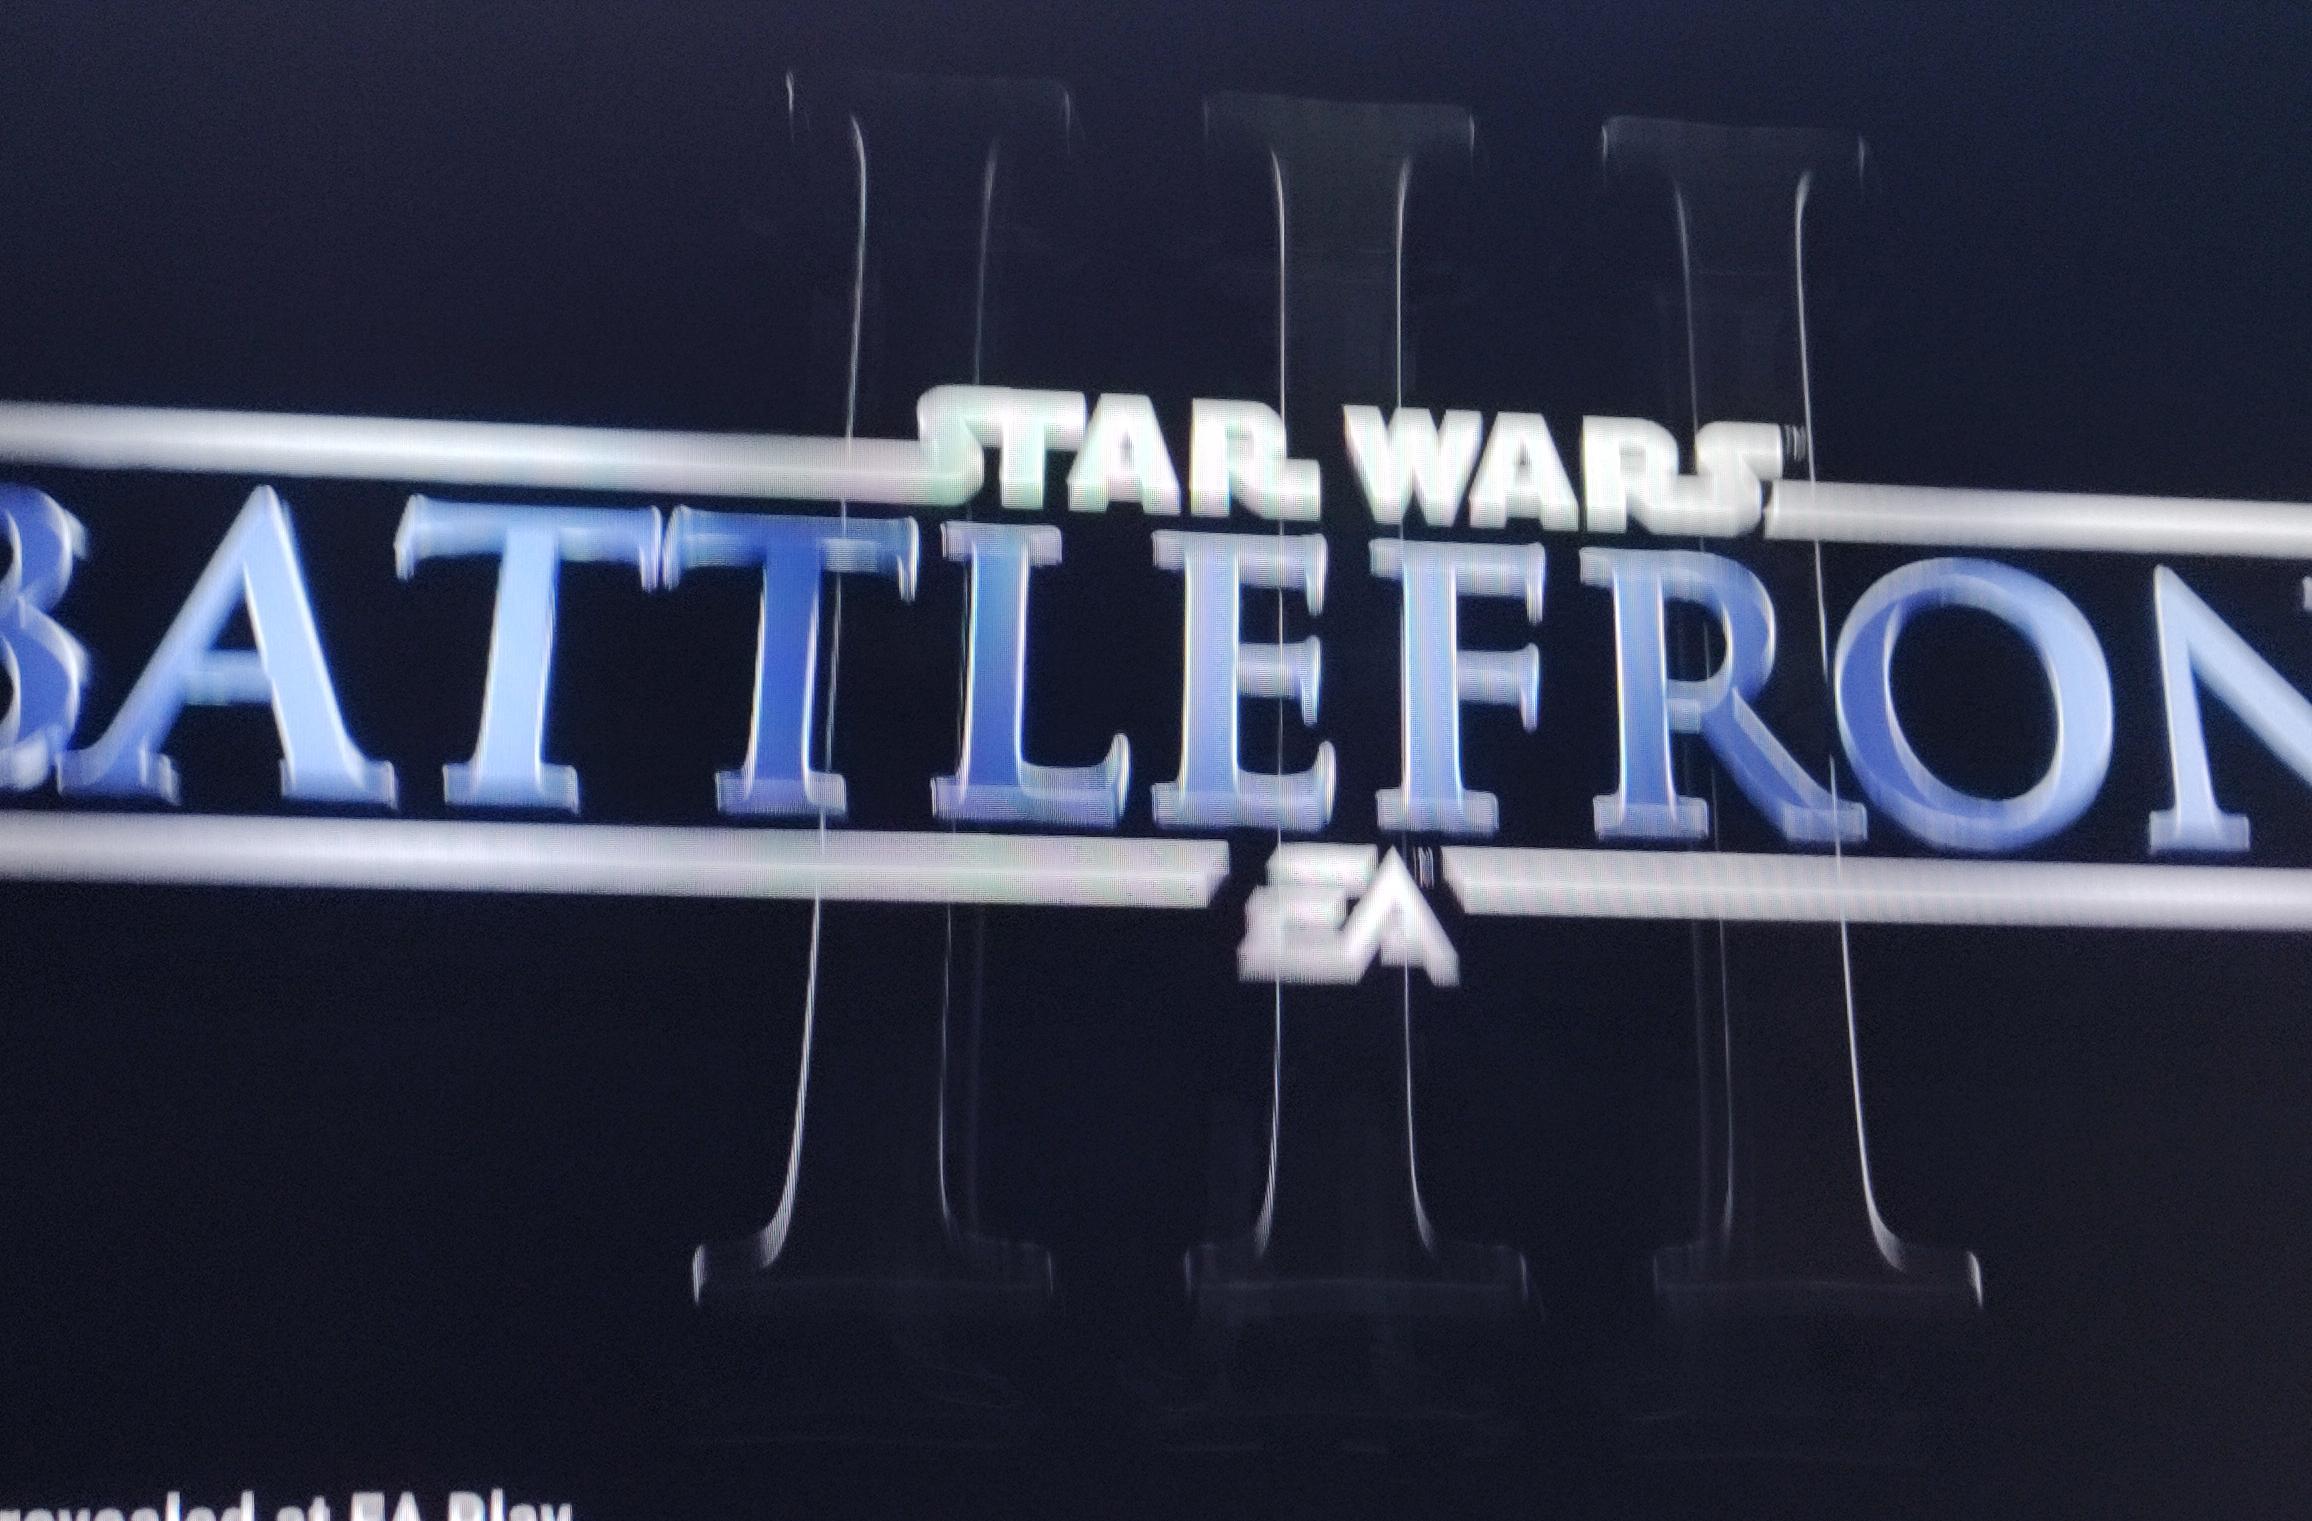 Star Wars Battlefront 3